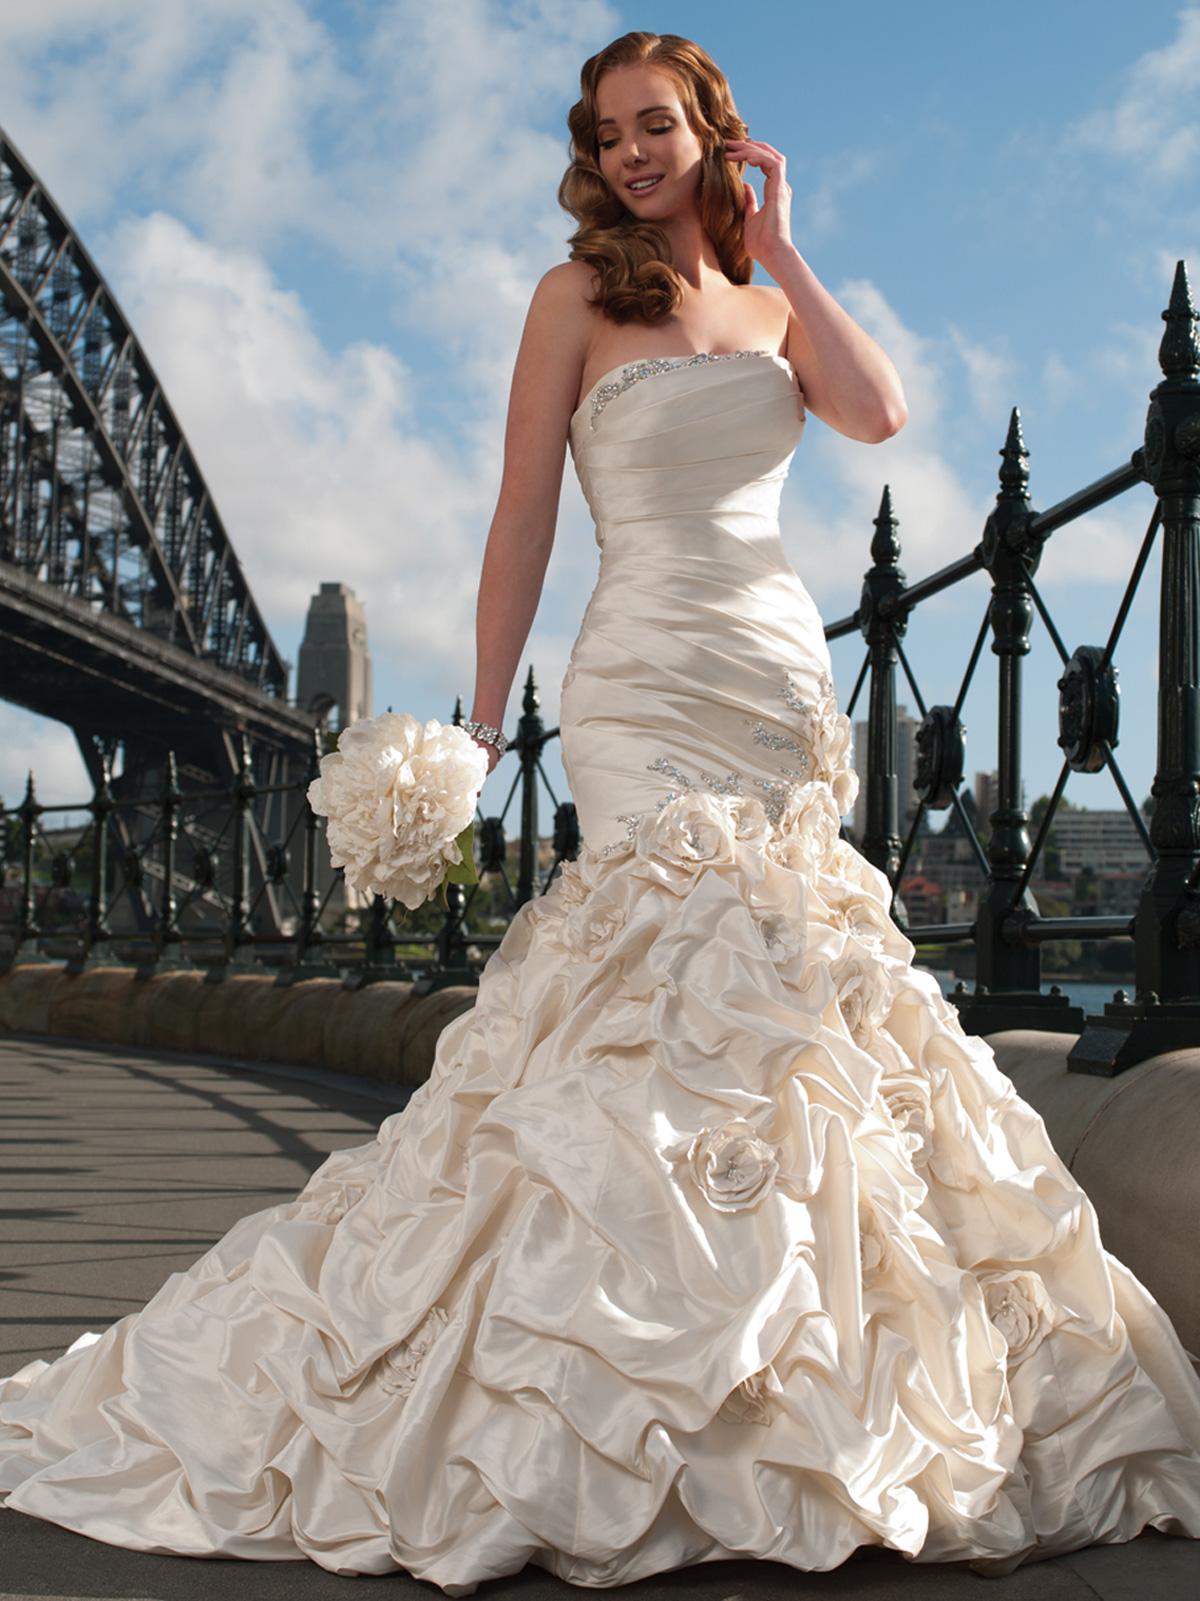 mermaid wedding dresses black mermaid wedding dresses Champagne Handmade Rose Pick Up Mermaid Wedding Dress